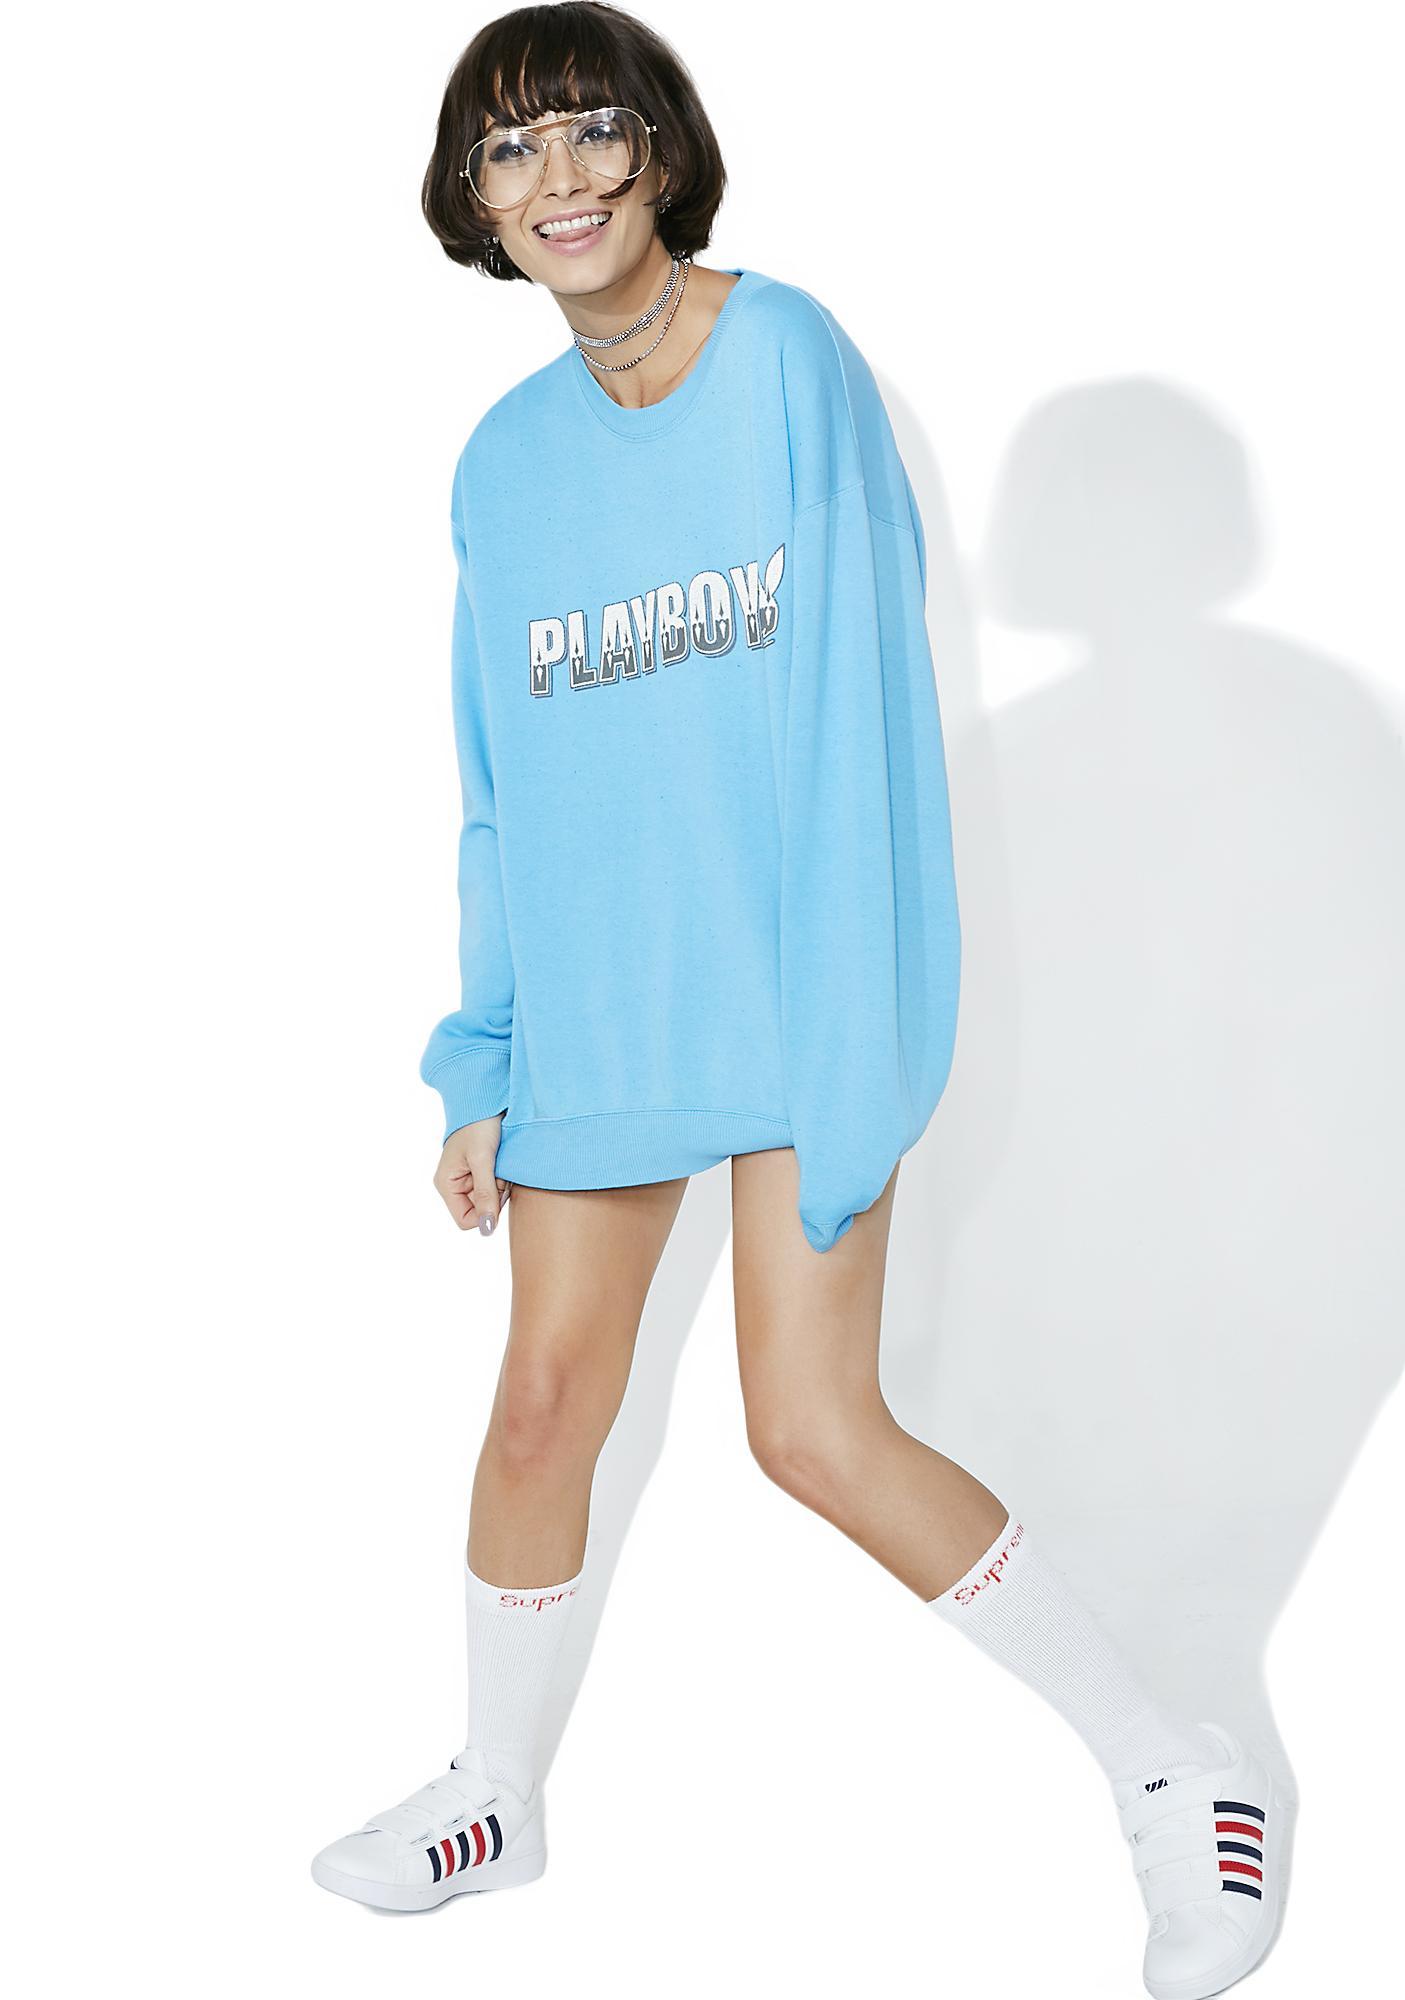 Vintage Playboy Crewneck Sweatshirt